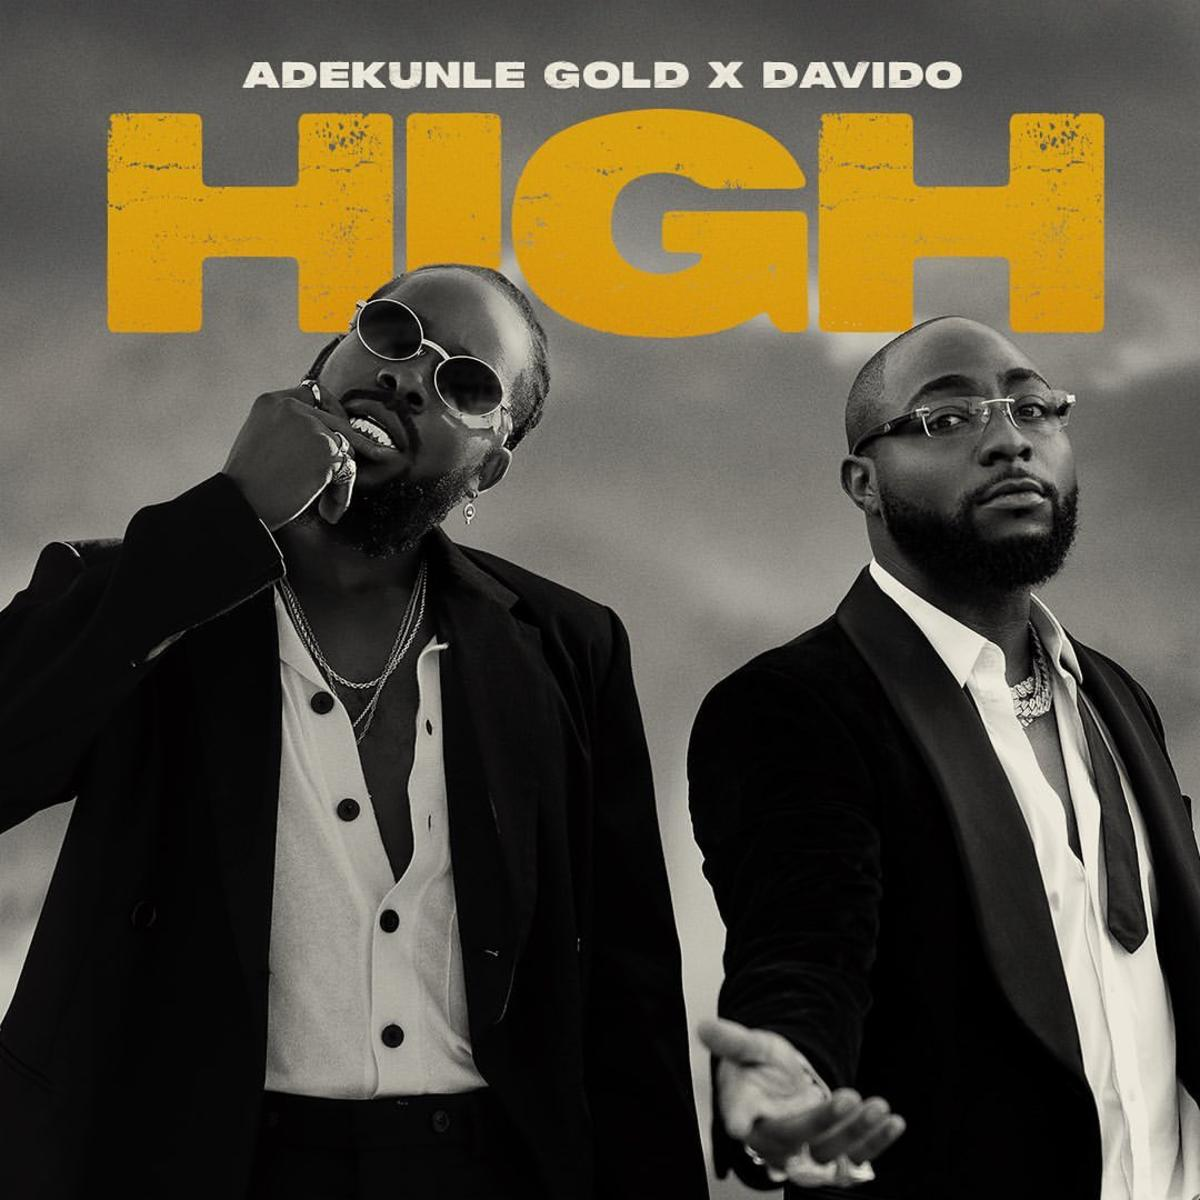 MP3: Adekunle Gold & Davido - High